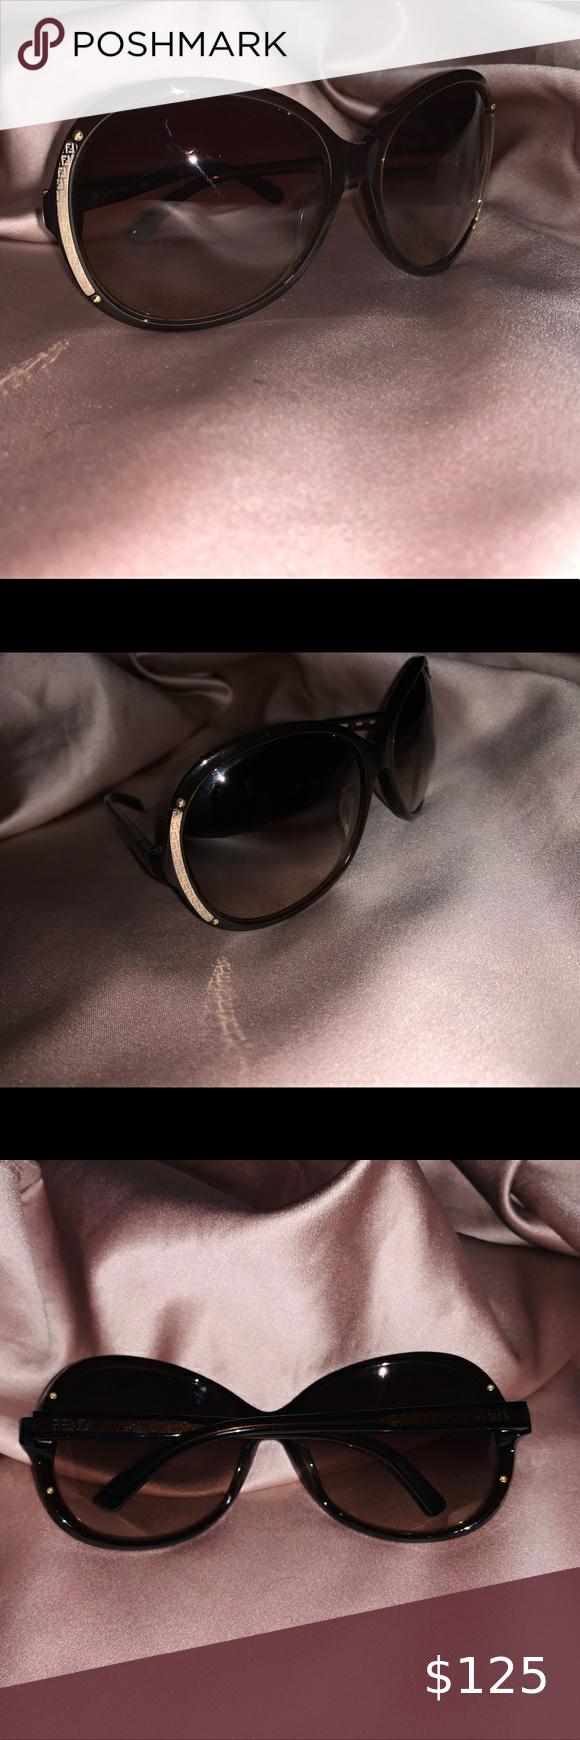 Fendi Oval Sunglasses Black Gold Brown 100% Auth Fendi Oval sunglasses !!! Like …